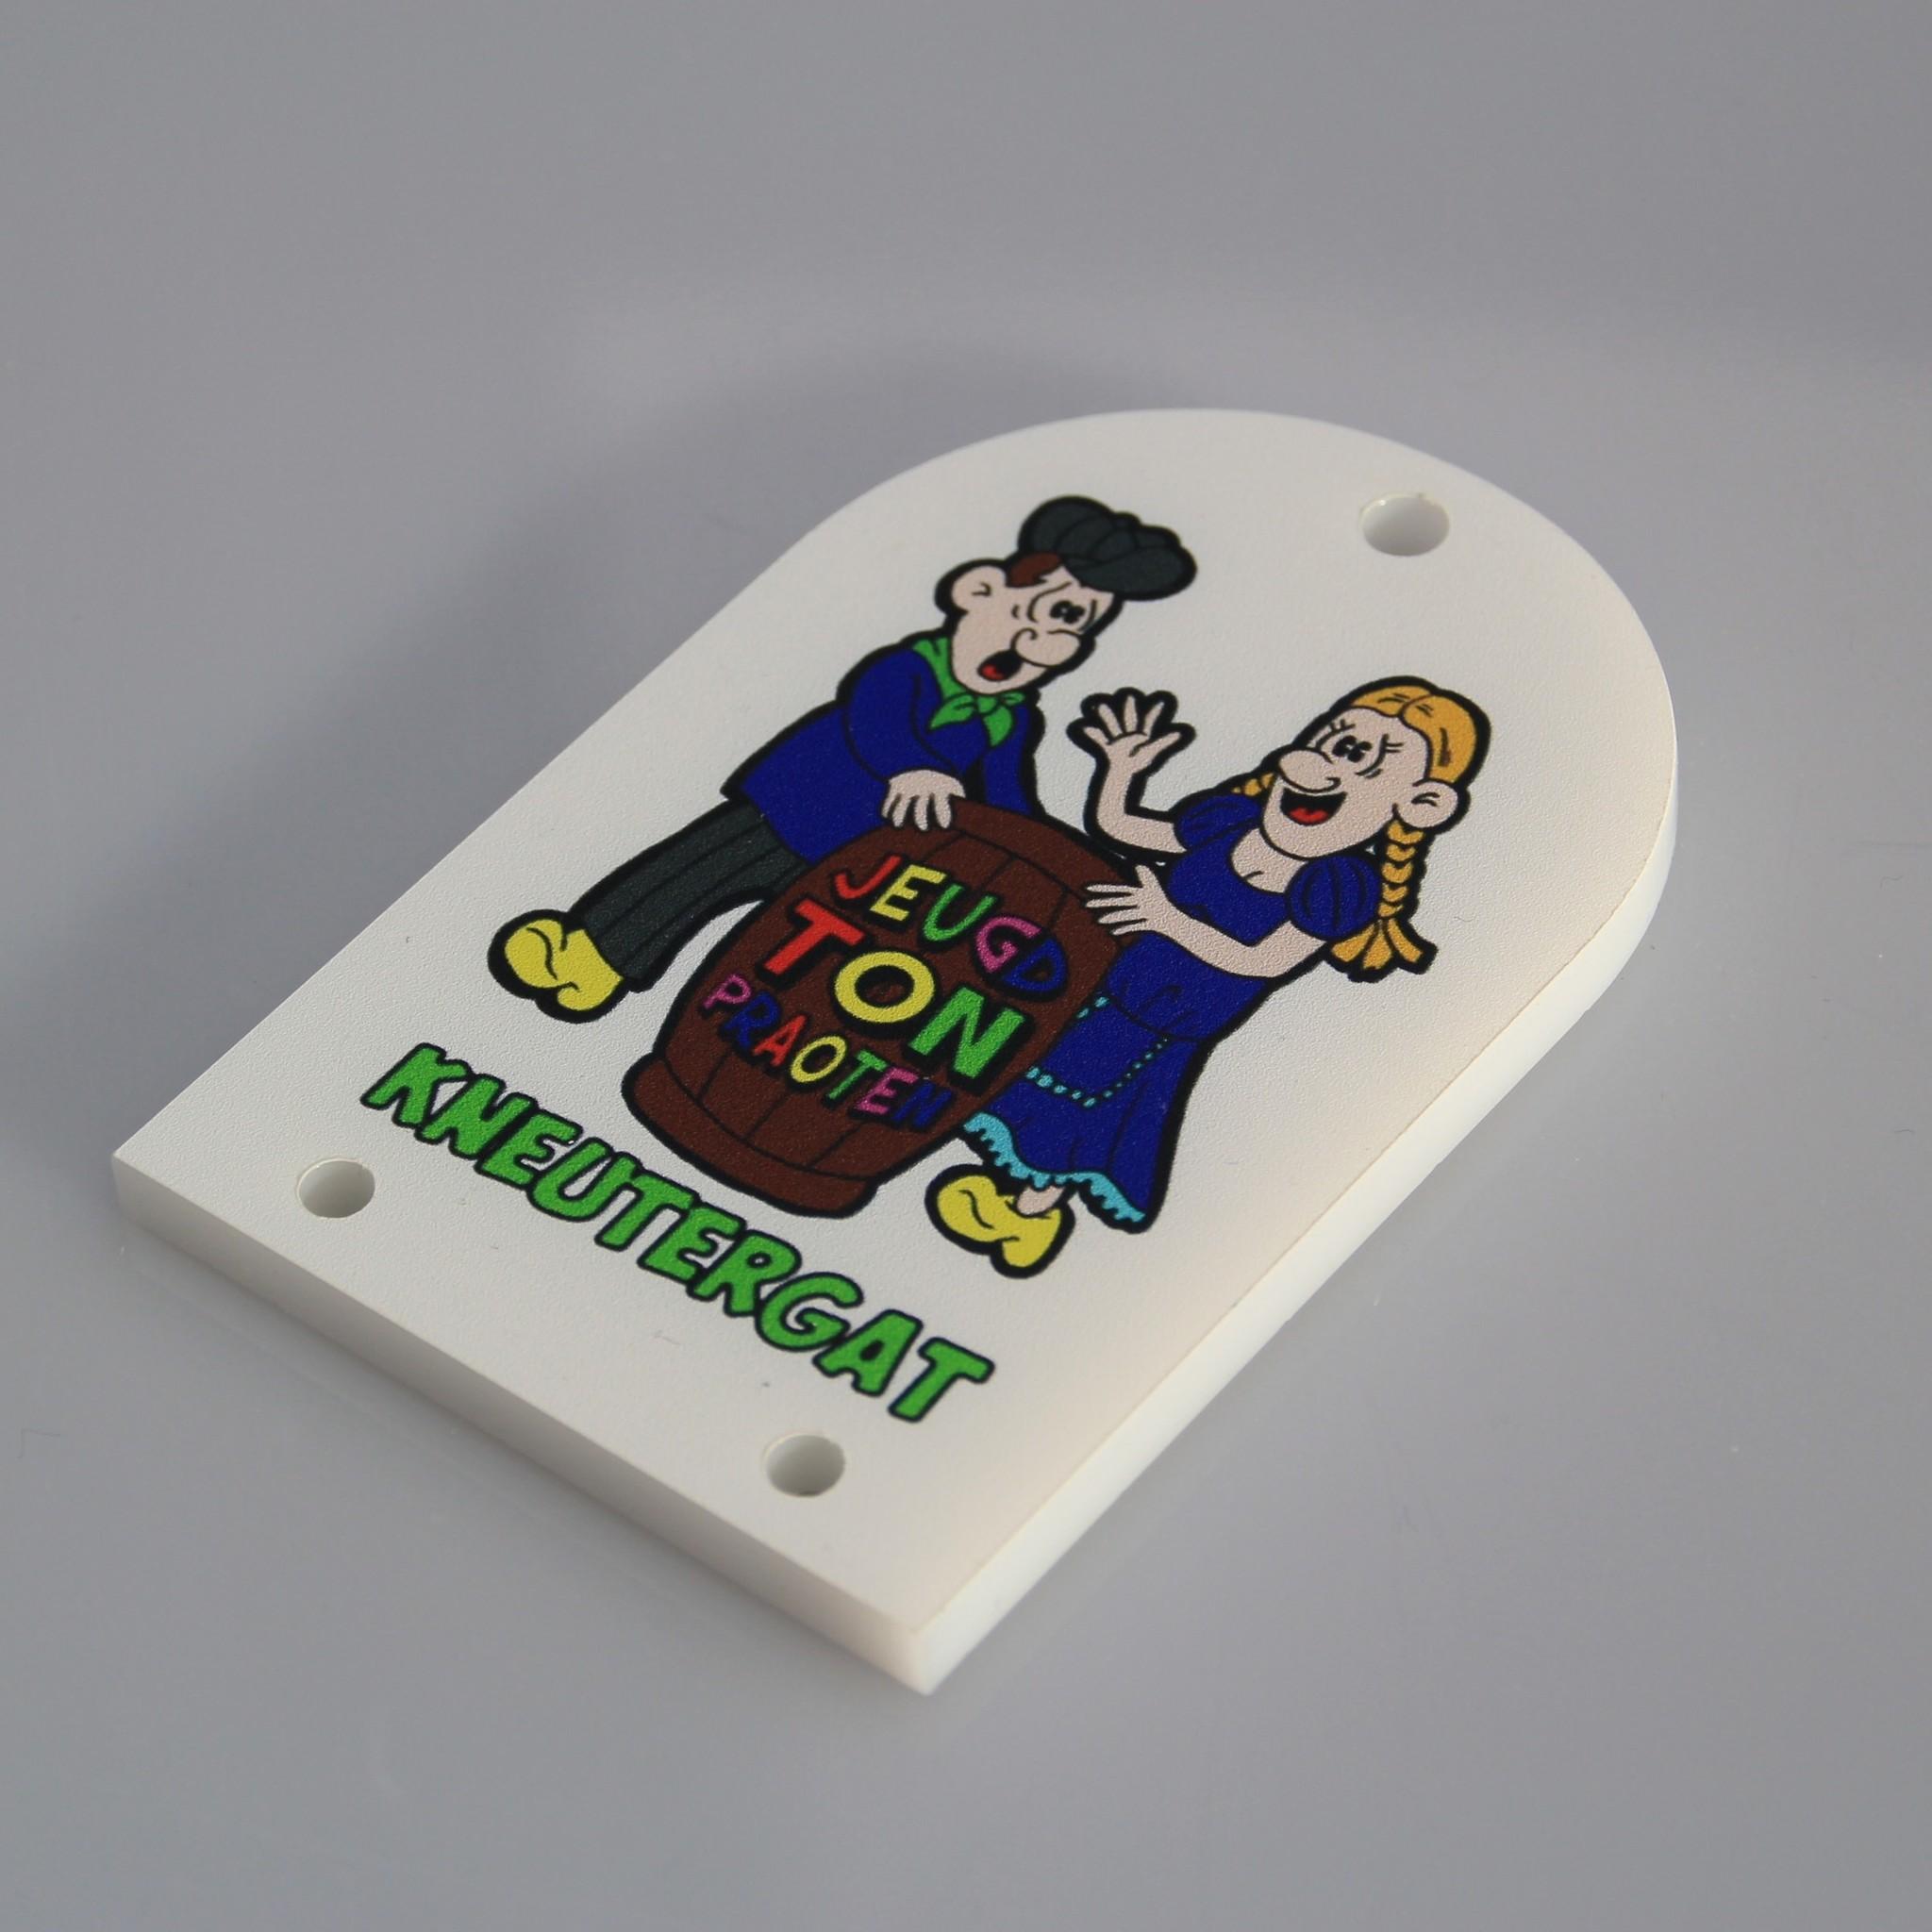 CombiCraft FullColour gedrukte Carnavalsmedailles of huisorde's in iedere buitenvorm, prijs per stuk vanaf: